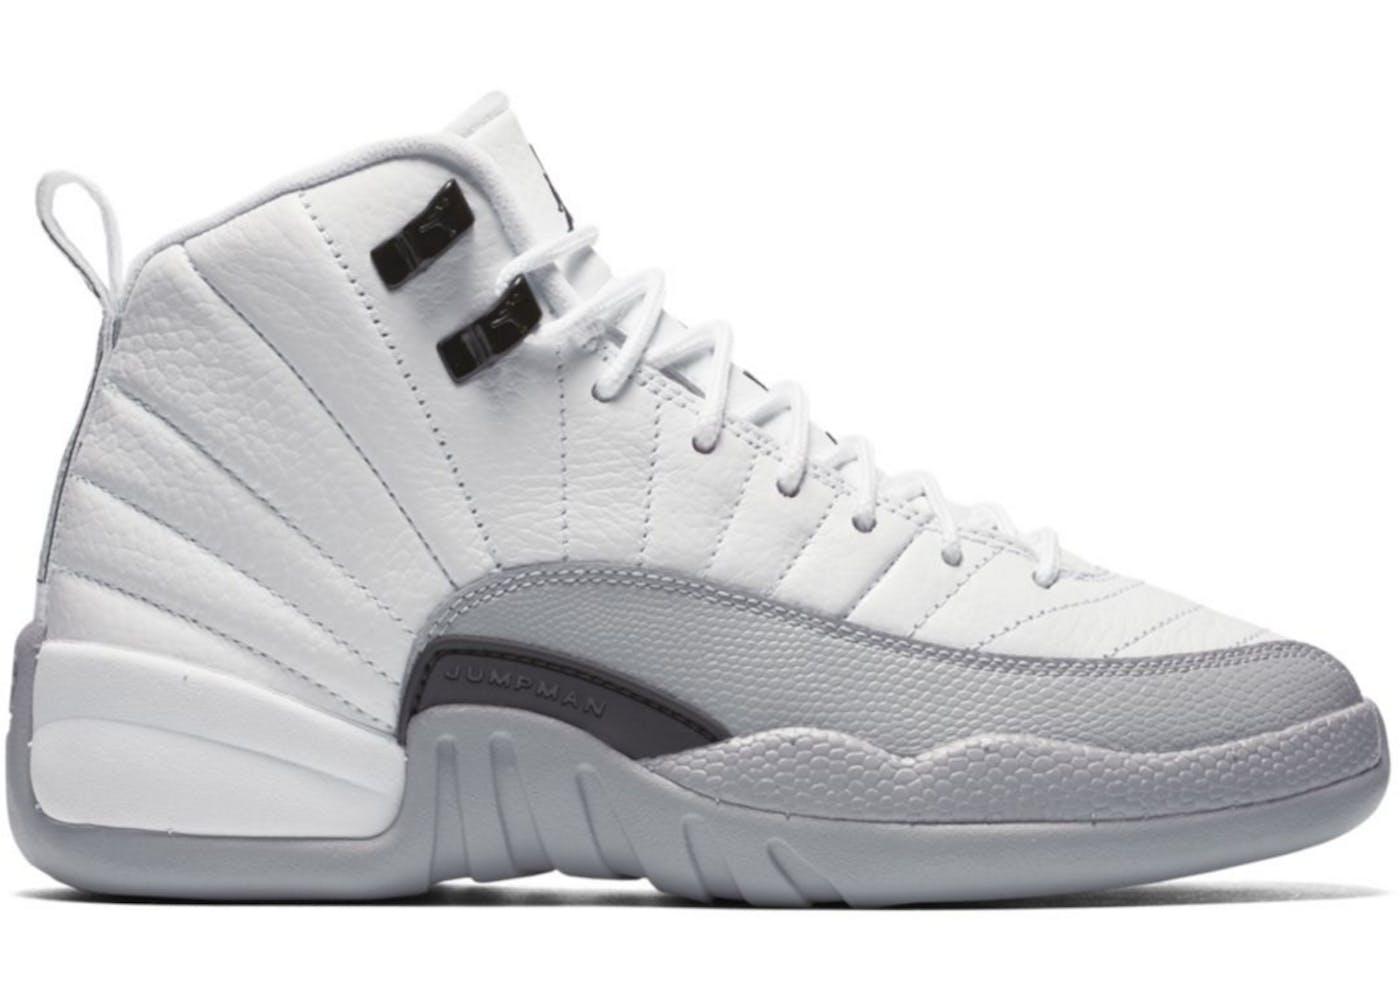 a8b1432c37de63 ... Jordan 12 Retro Barons (GS) ... air jordan ix white size 7.5y ...